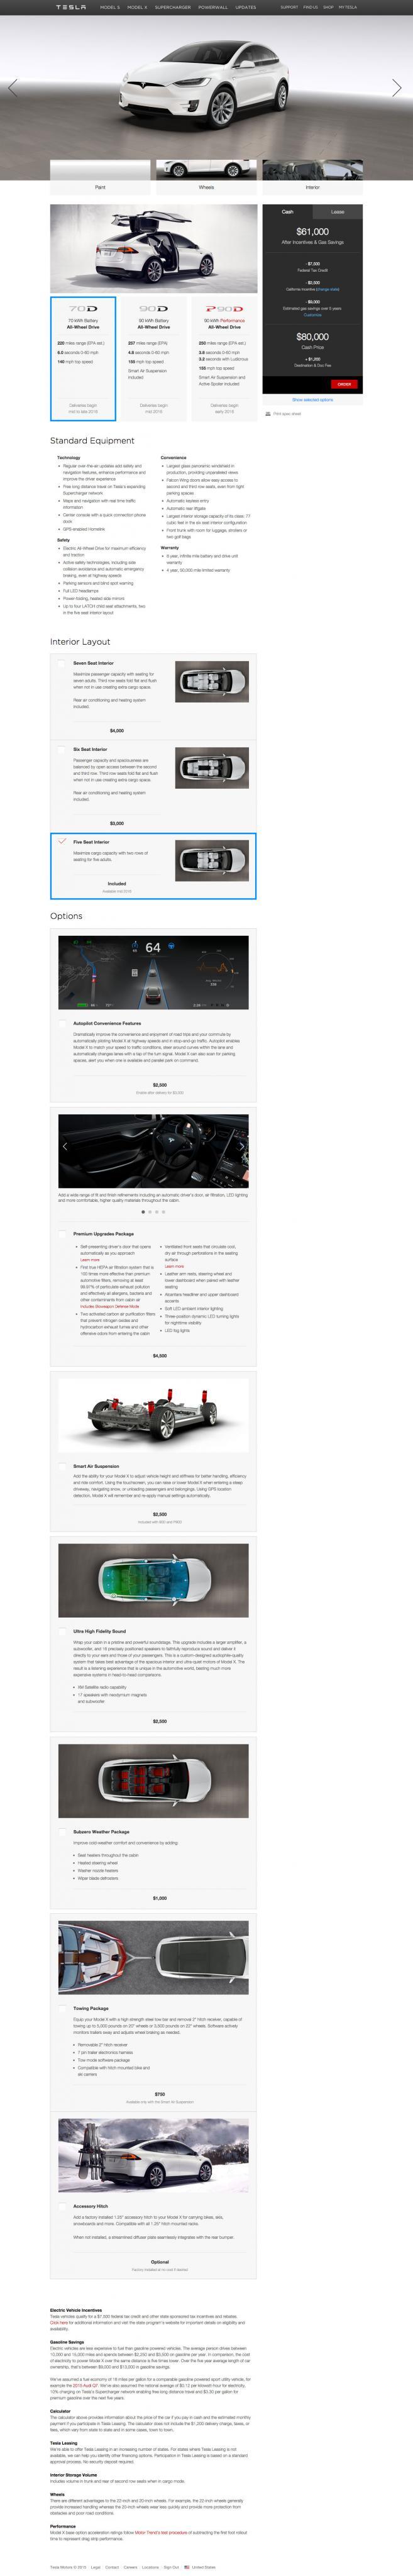 model-x-design-studio.jpg